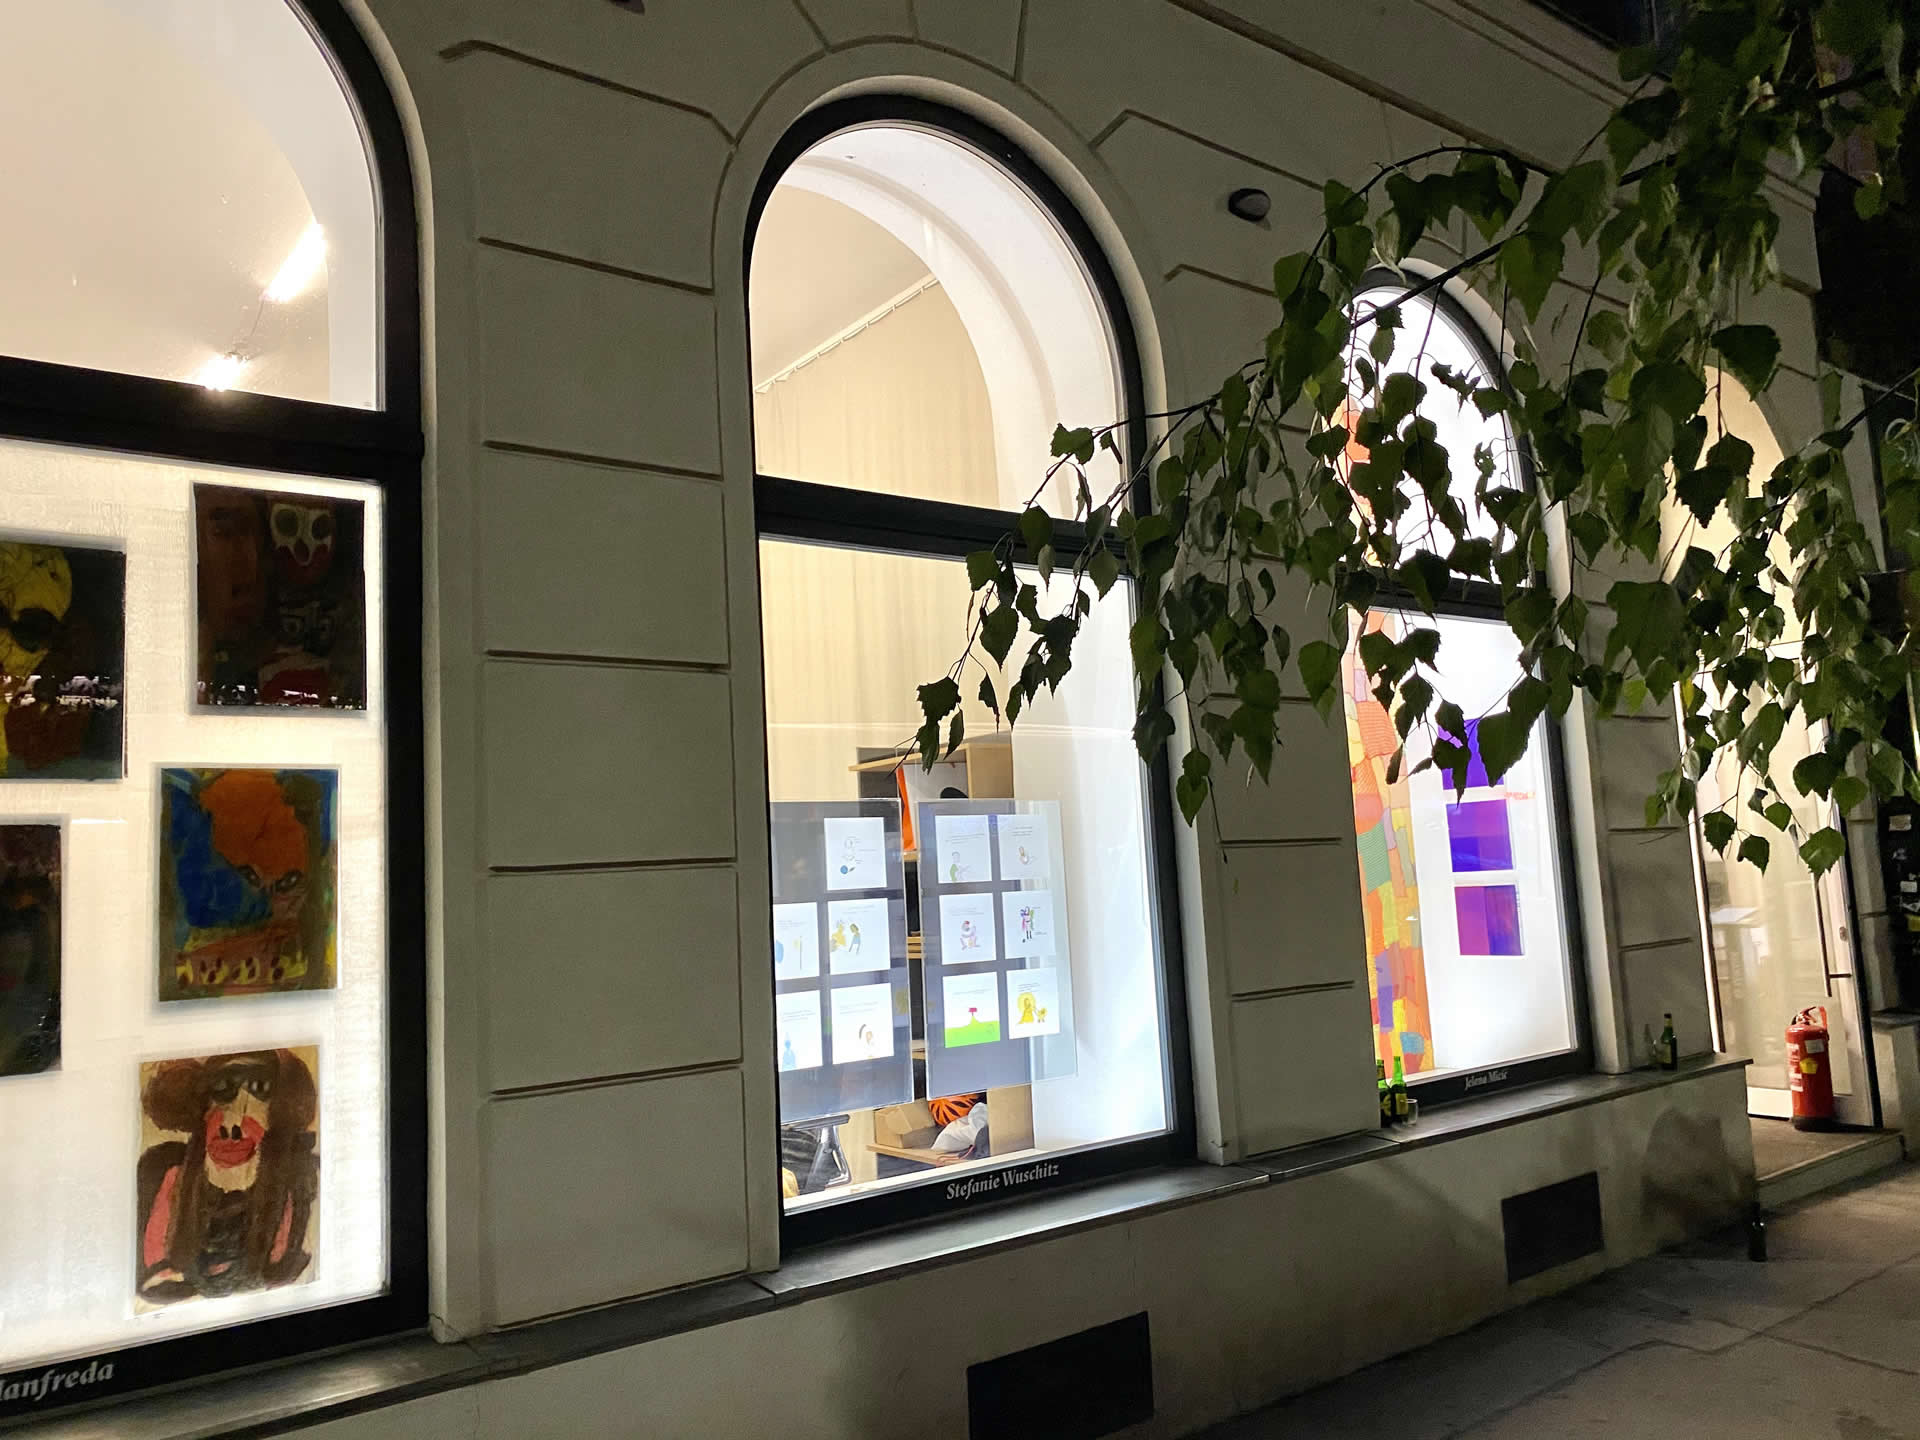 The Window Show